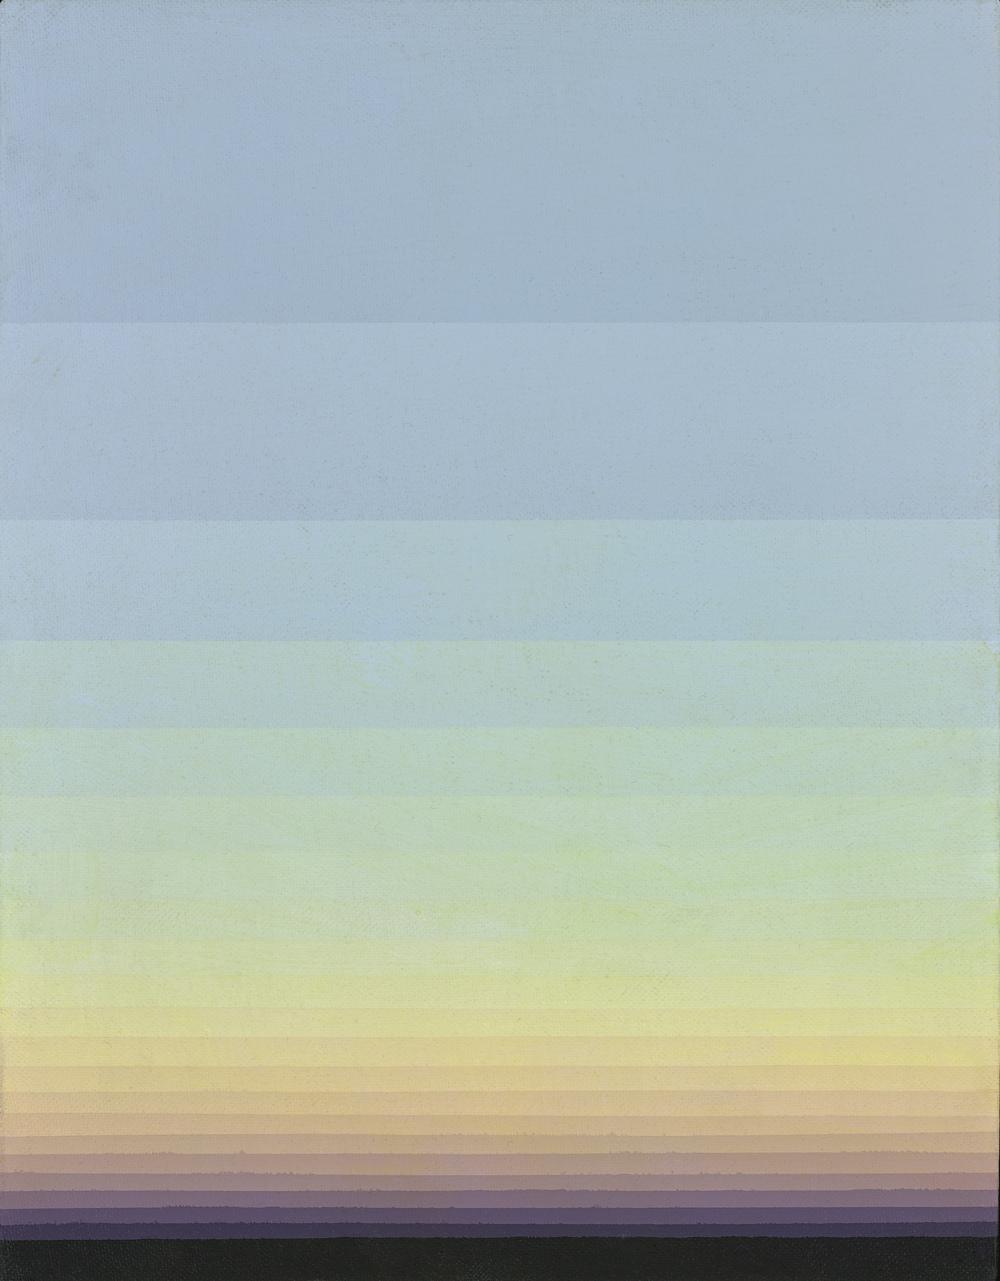 Norman Zammitt, Grey 28A, 1986, acrylic on canvasboard, 11 x 14 inches; 27.9 x 35.6 centimeters